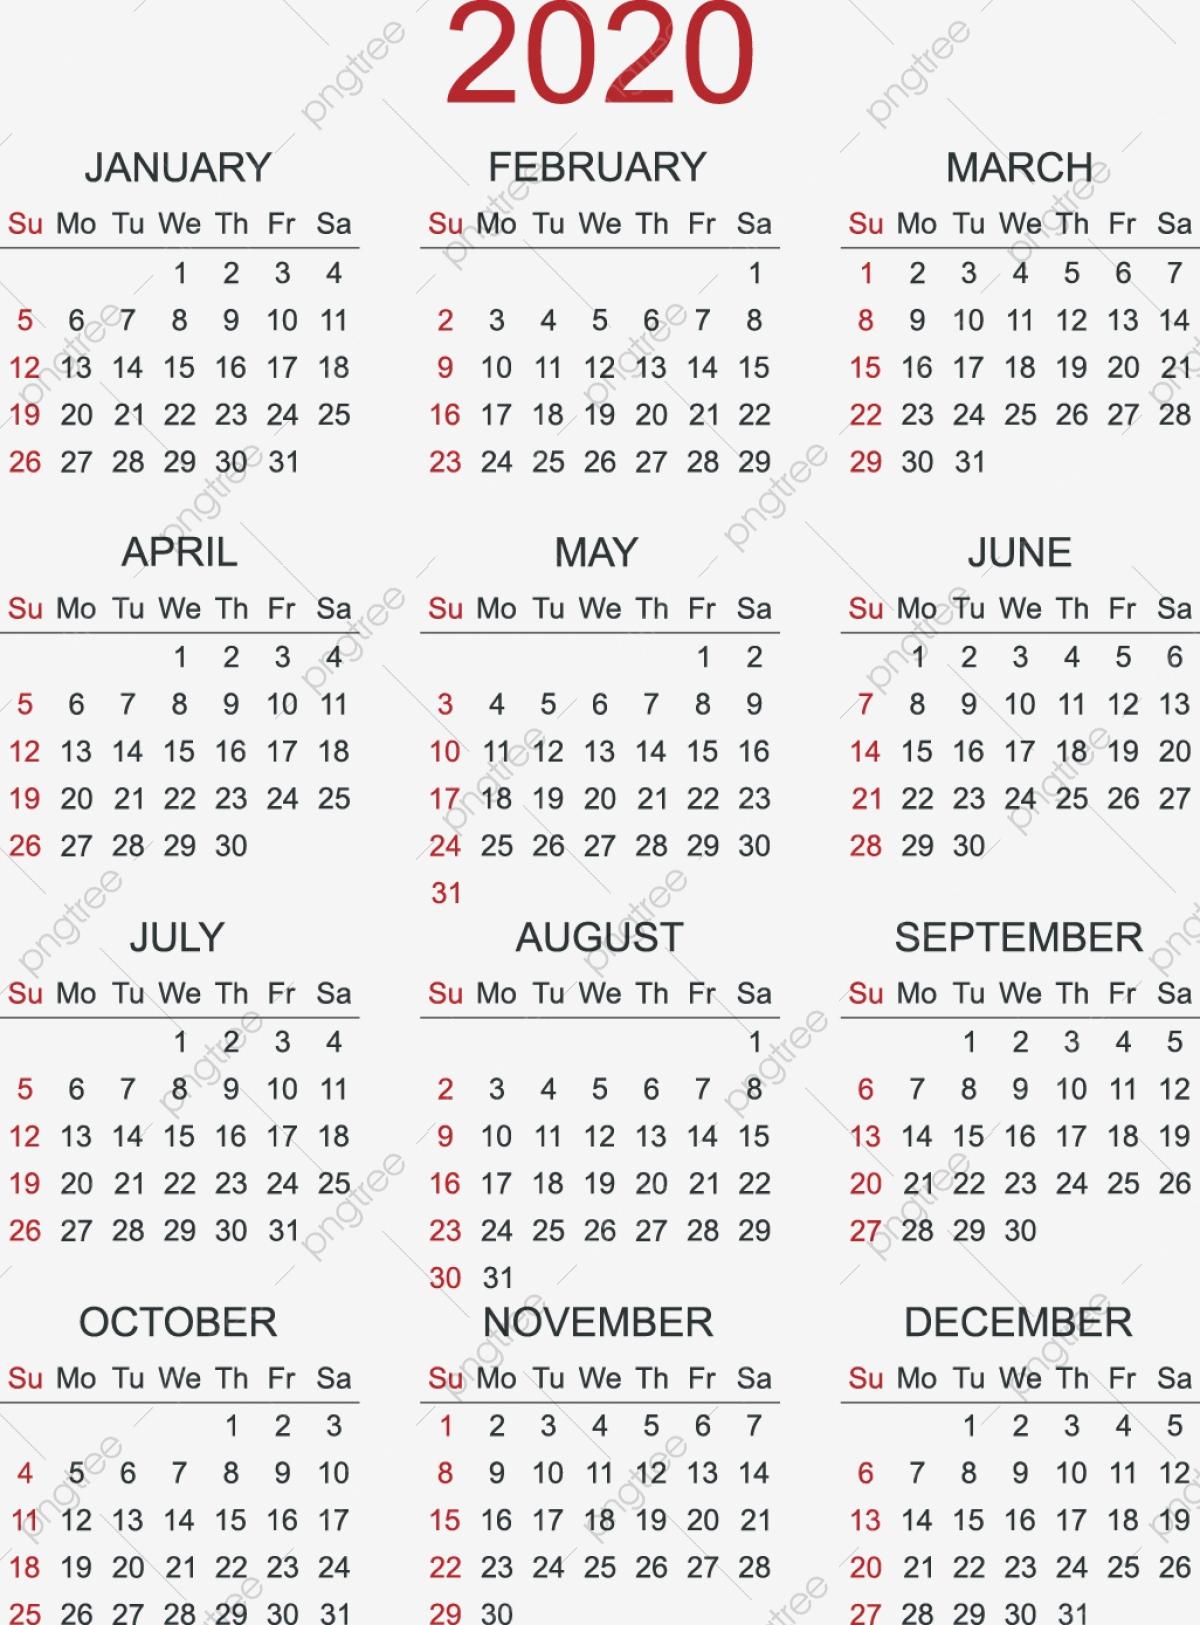 2020 Calendar,calendar,2020 Calendar,calendar,2020 Calendar